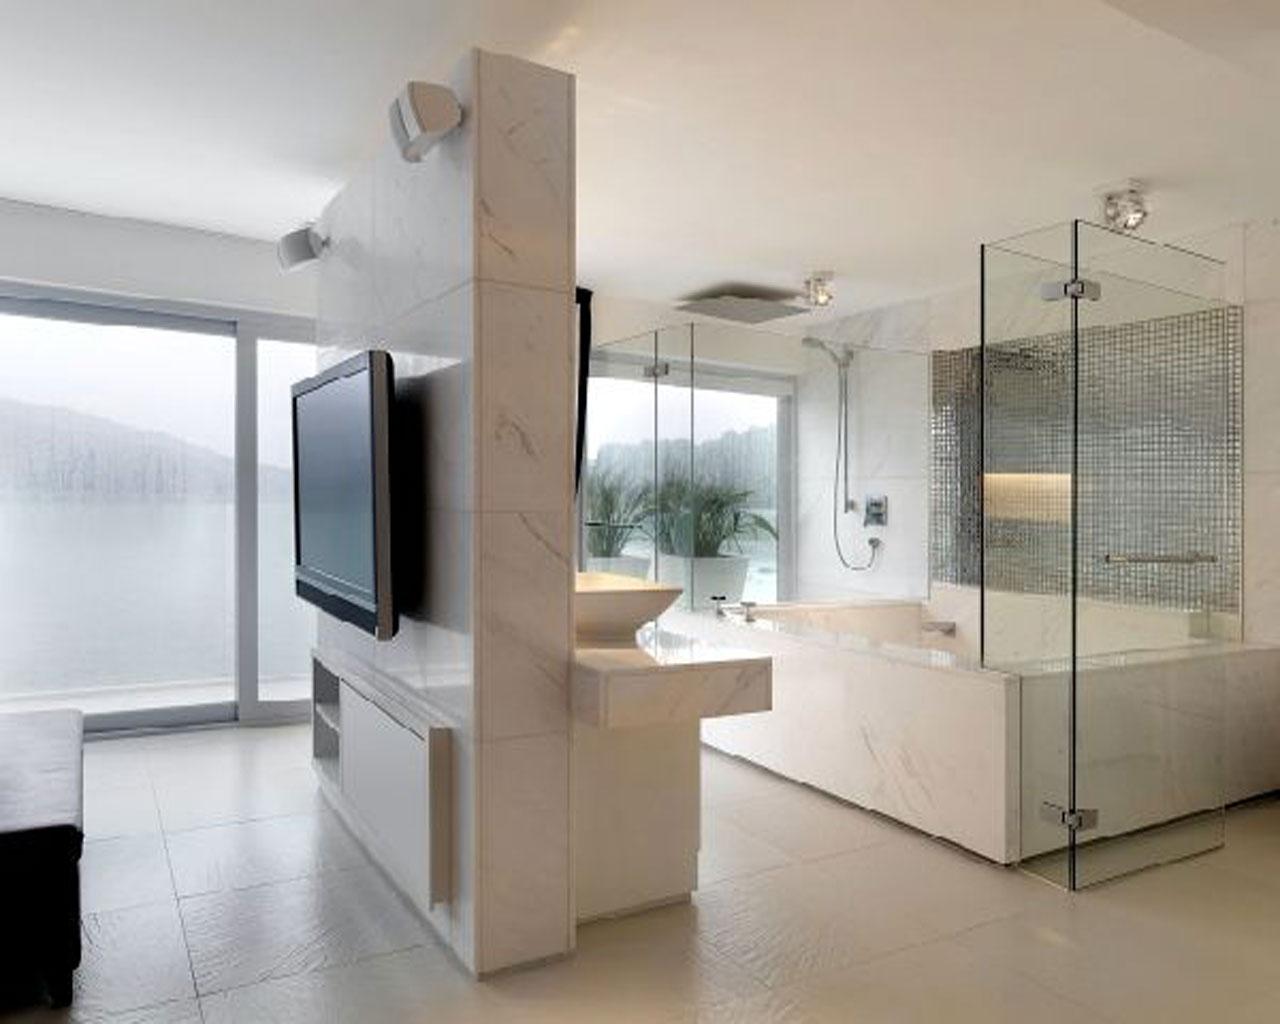 master bathroom. Design Bathrooms  7 Awesome Best Small Bathroom Designs Small